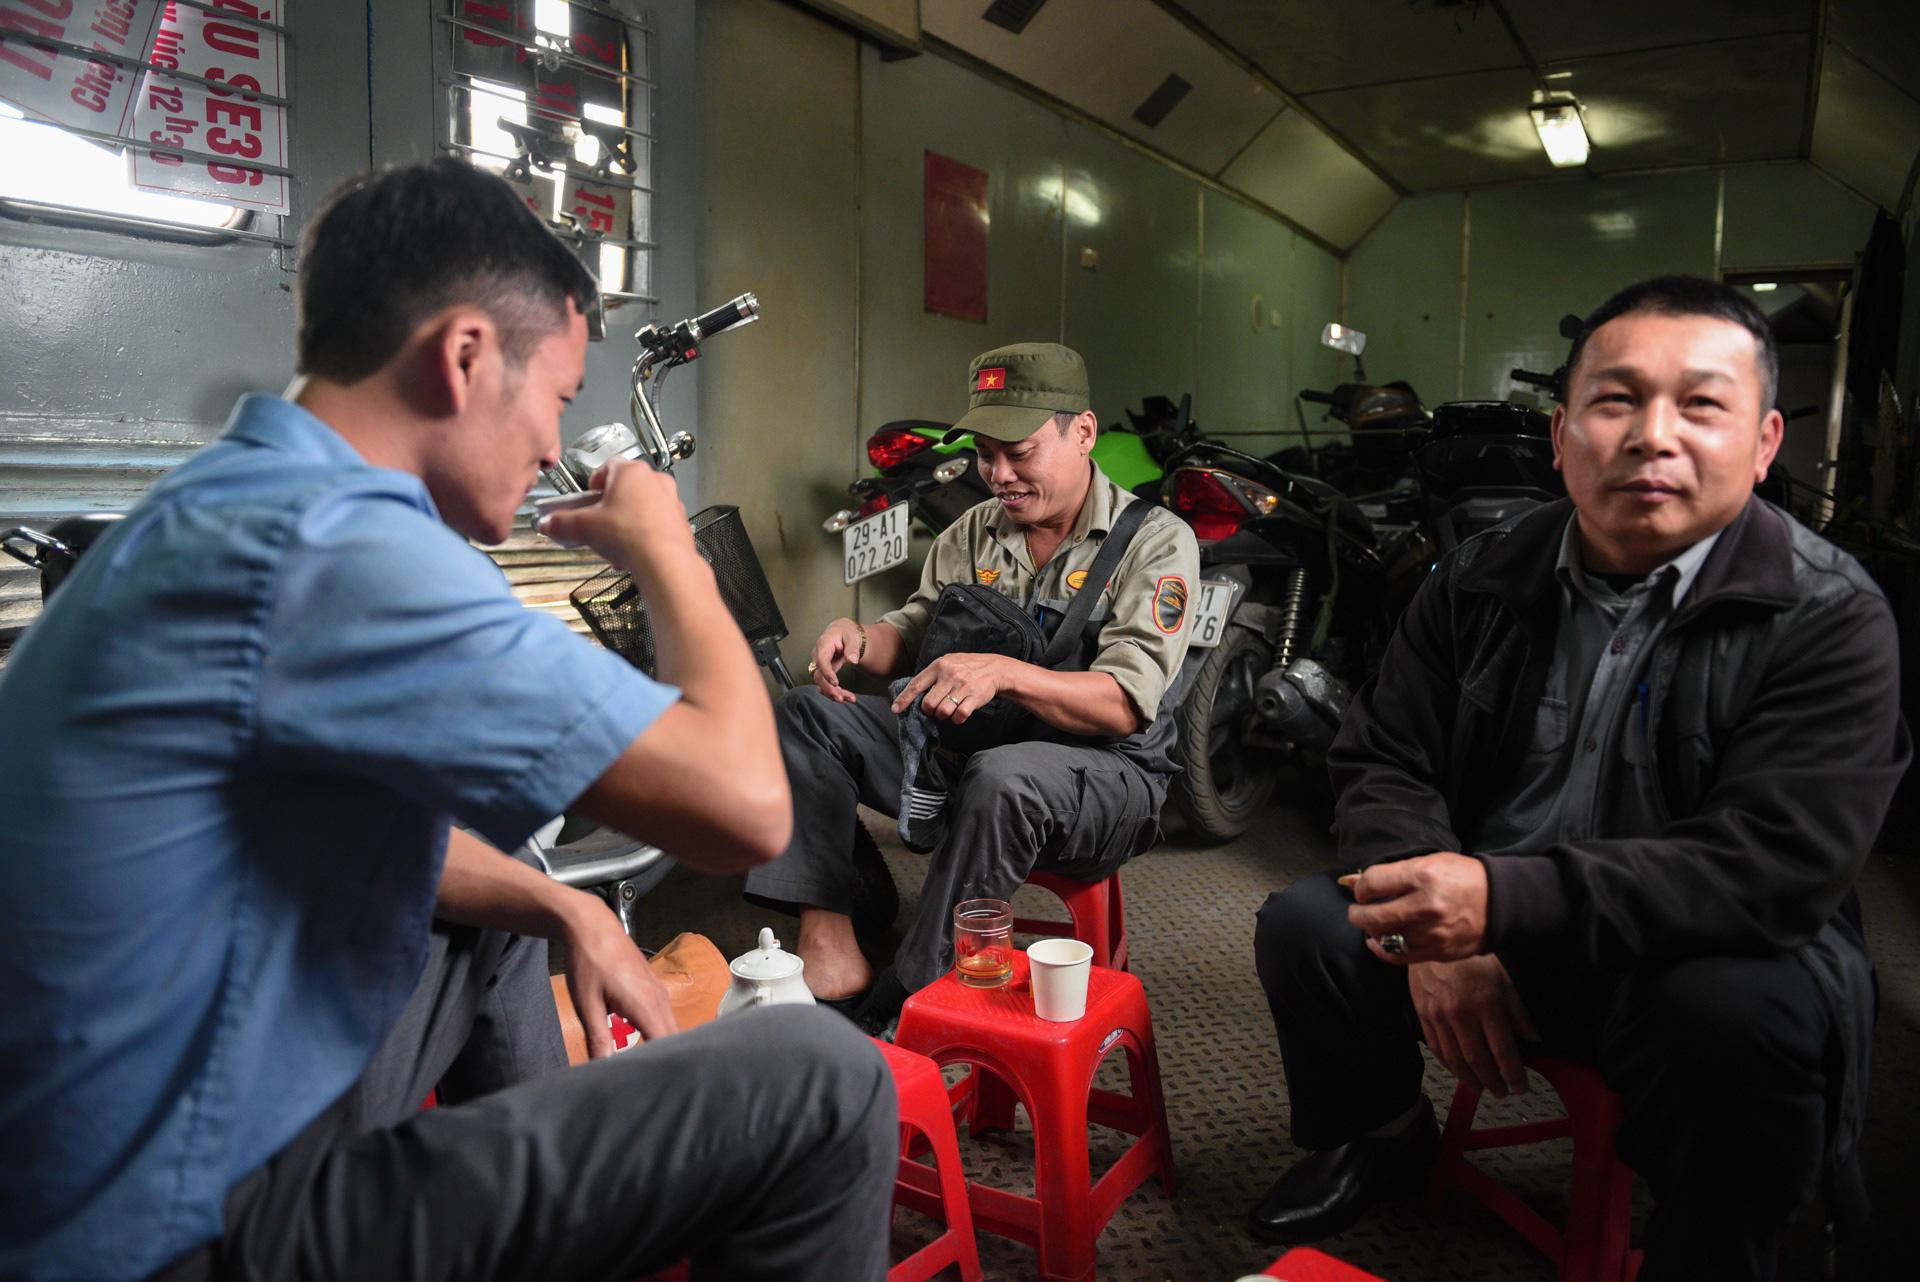 Tet tren nhung chuyen tau cuoi cung cua nam Ky Hoi hinh anh 23 DSC_2599_zing.jpg